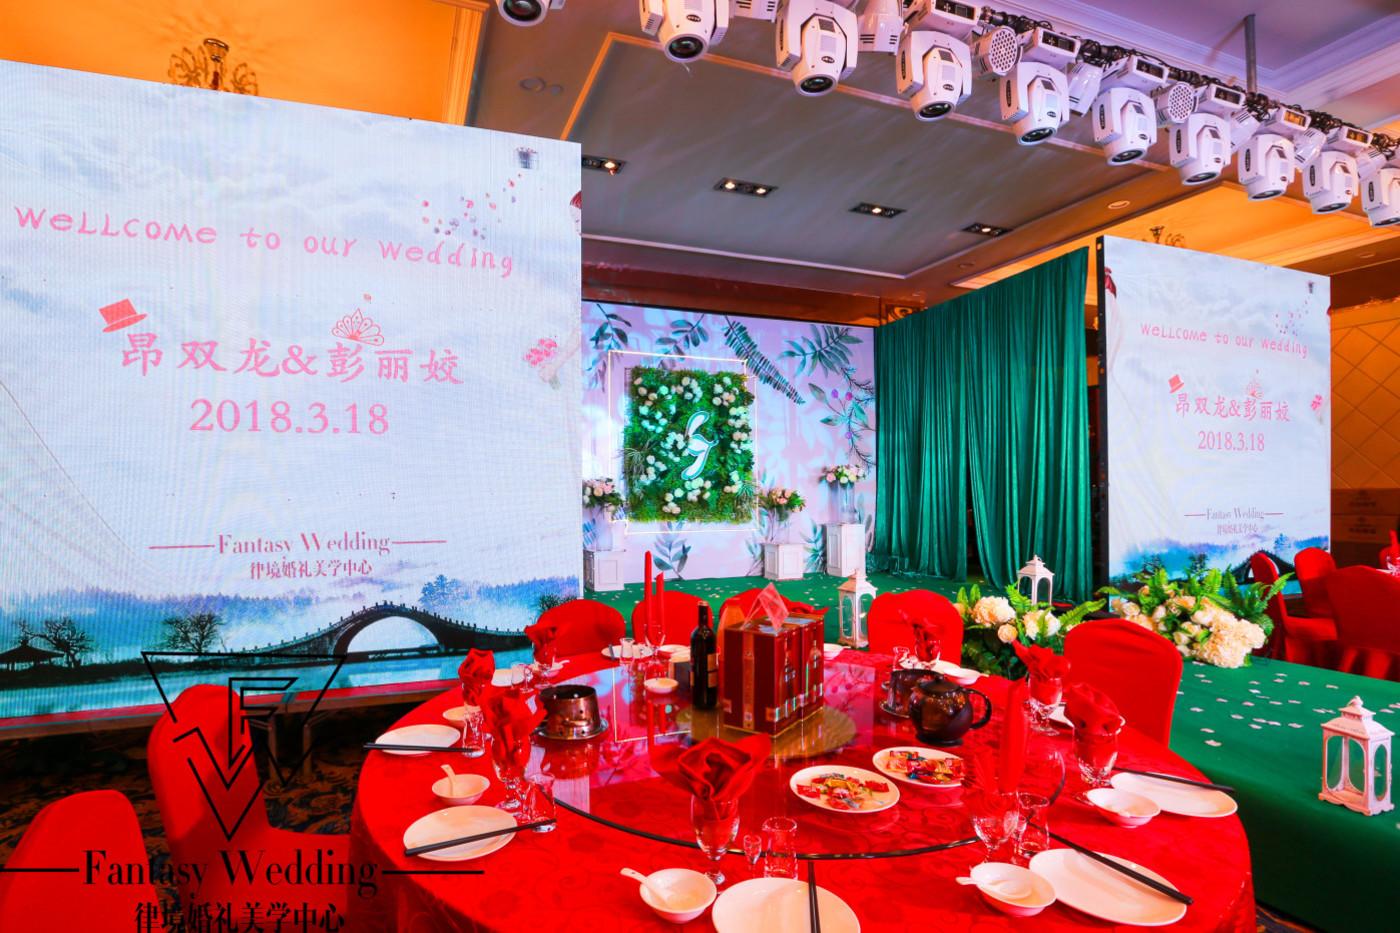 「Fantasy Wedding」& A/P 南艳湖22